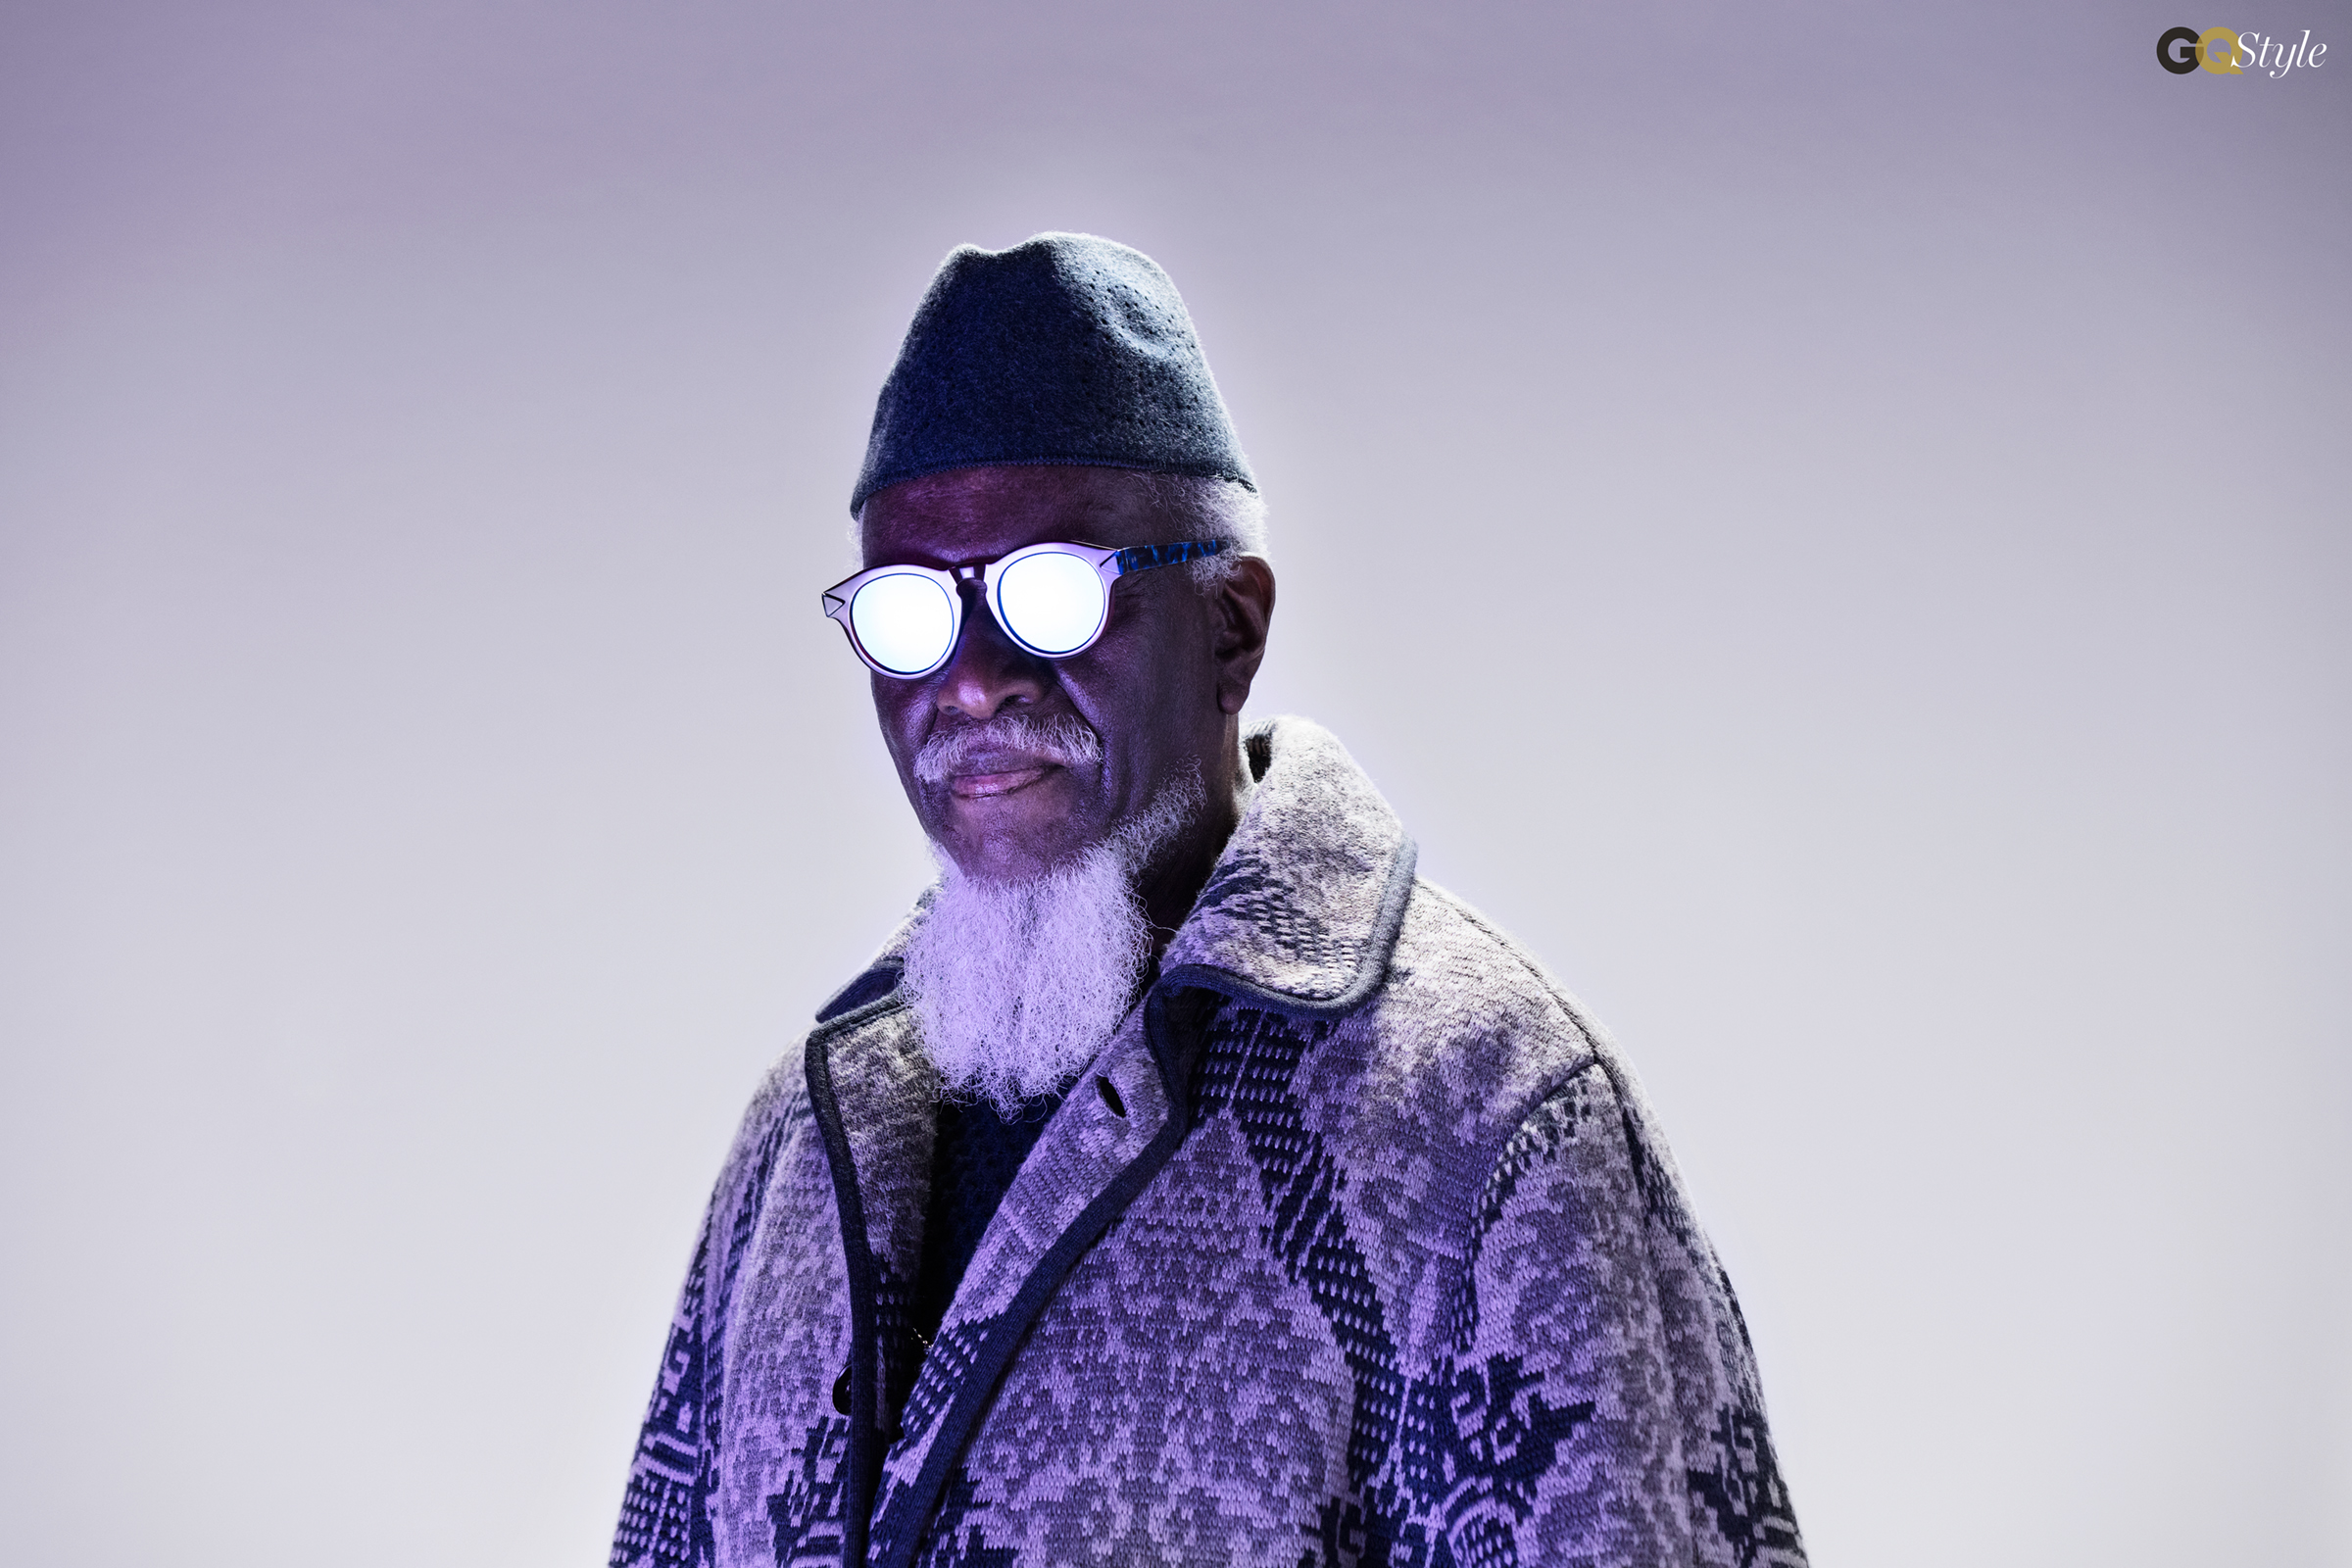 Jazz musician Pharoah Sanders